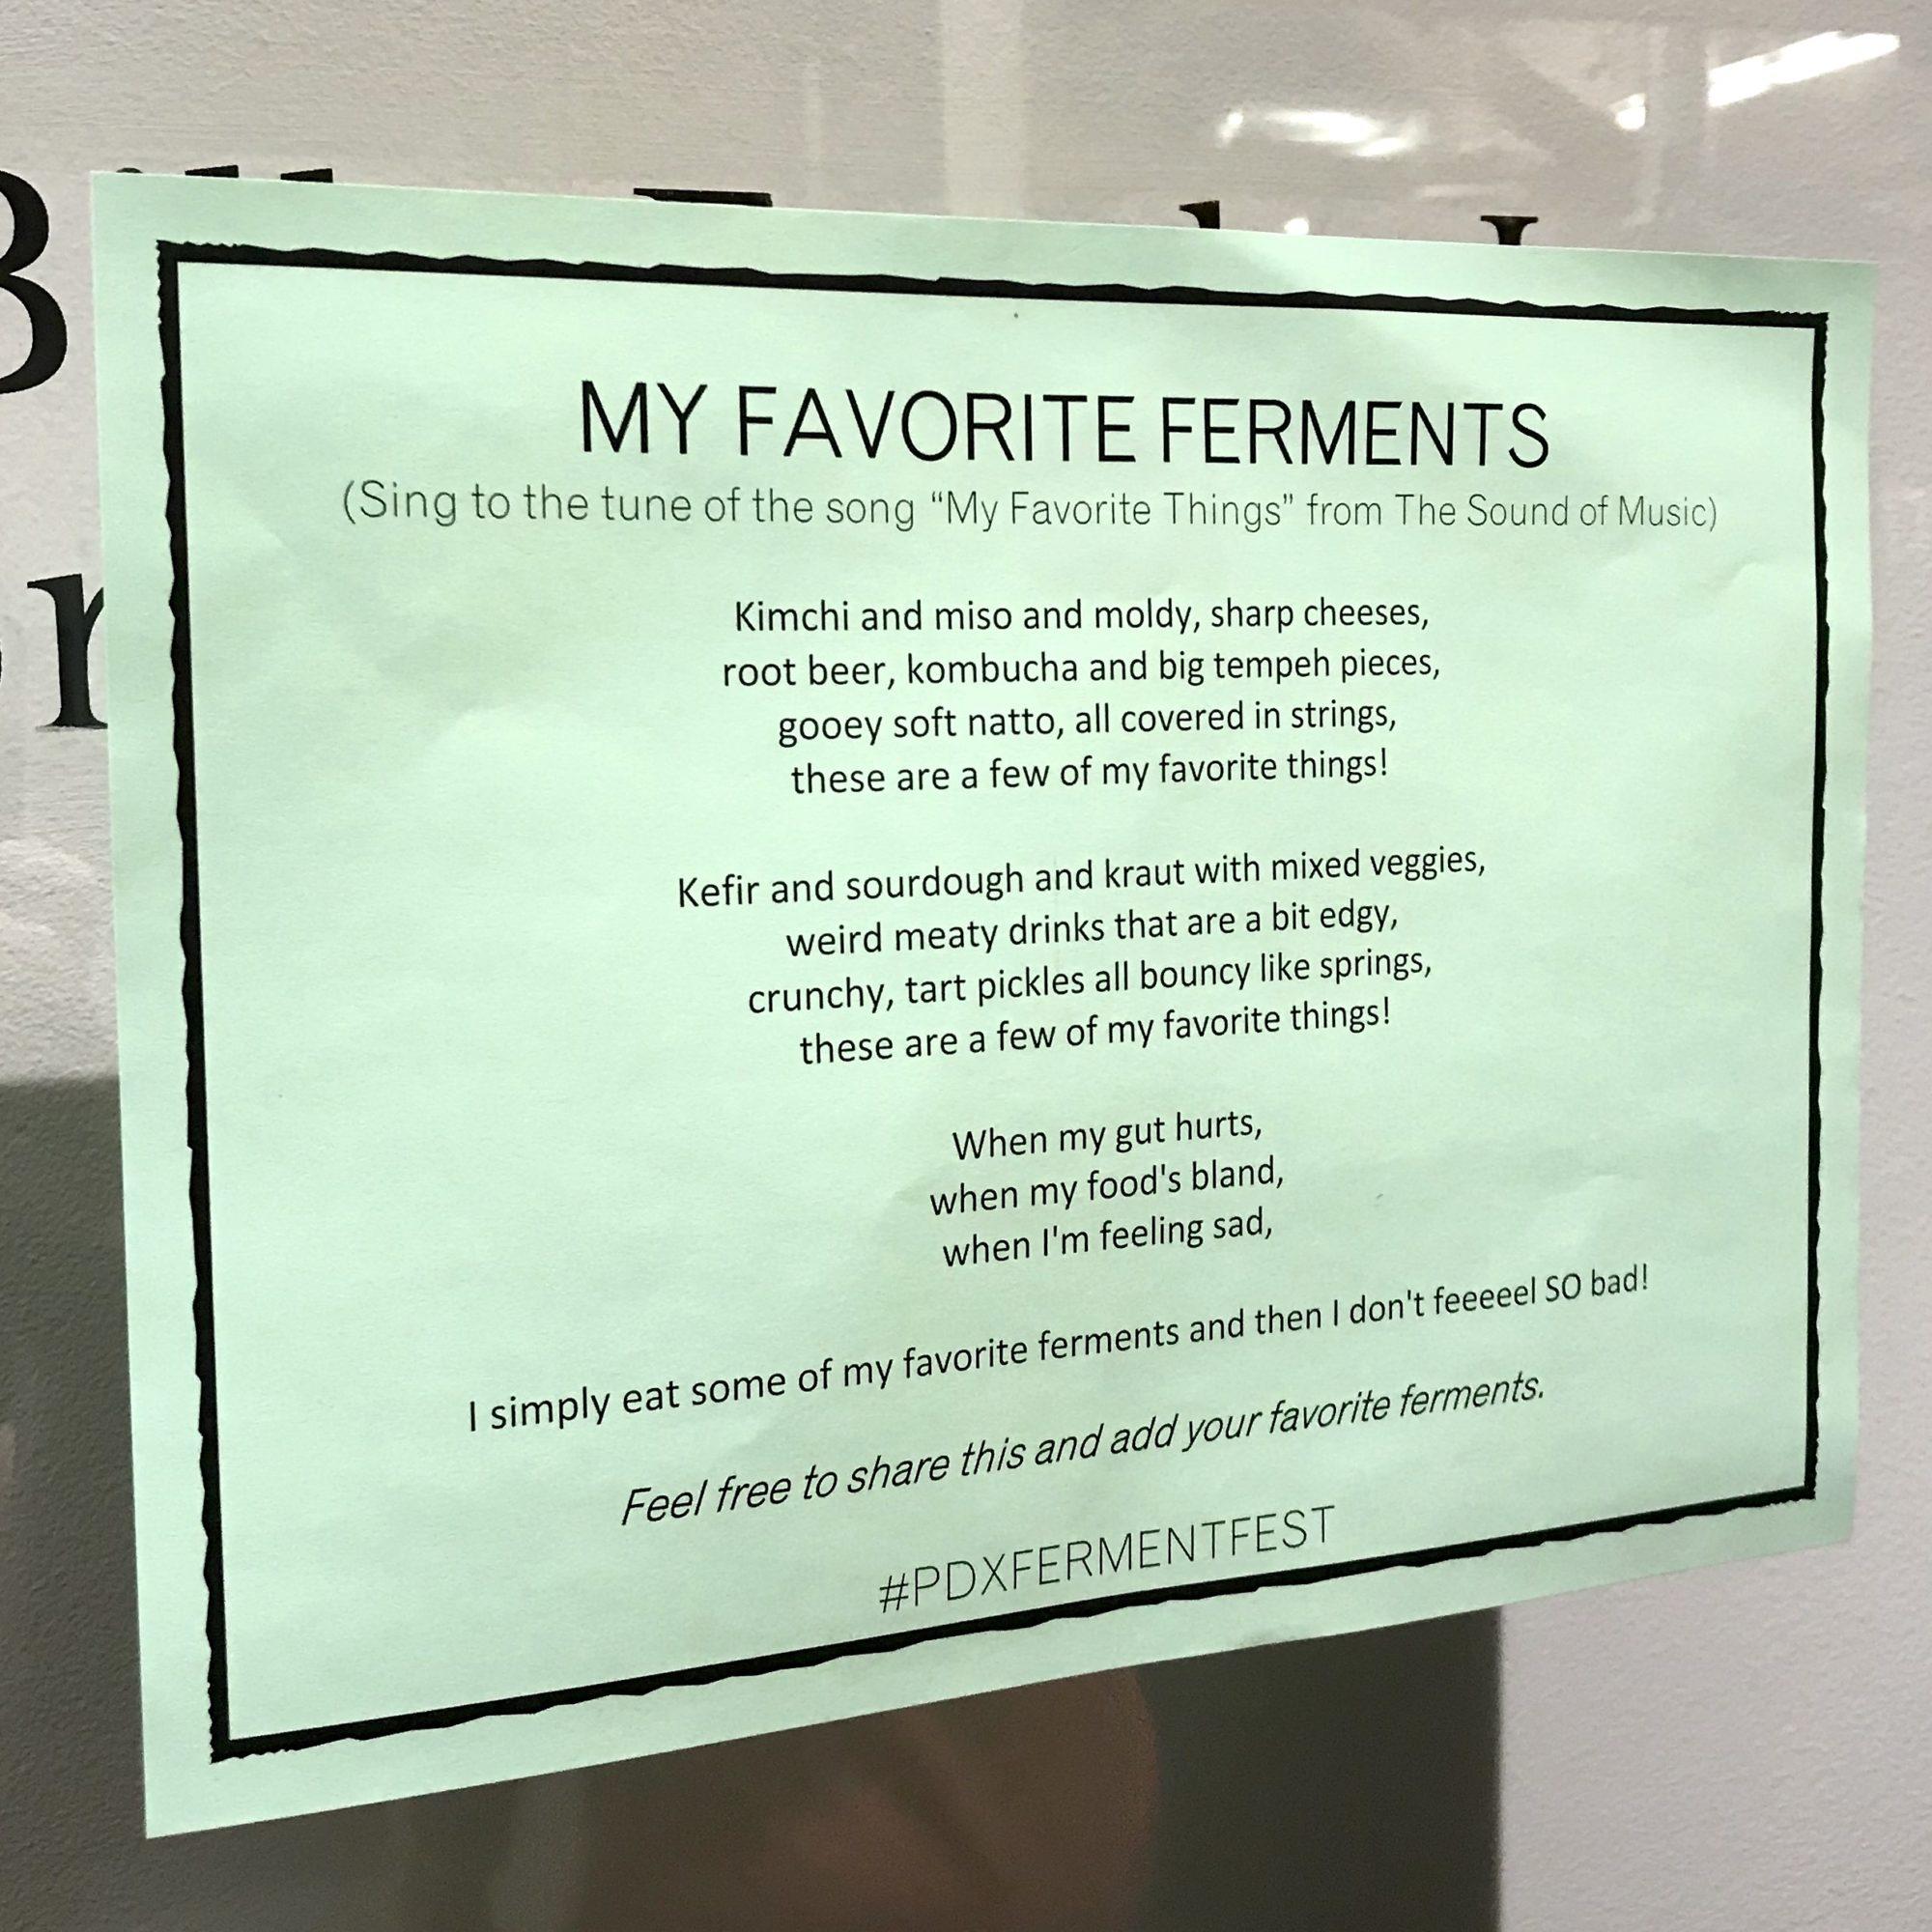 my-favorite-ferments-lyrics-portland-fermentation-festival-2019-oregon